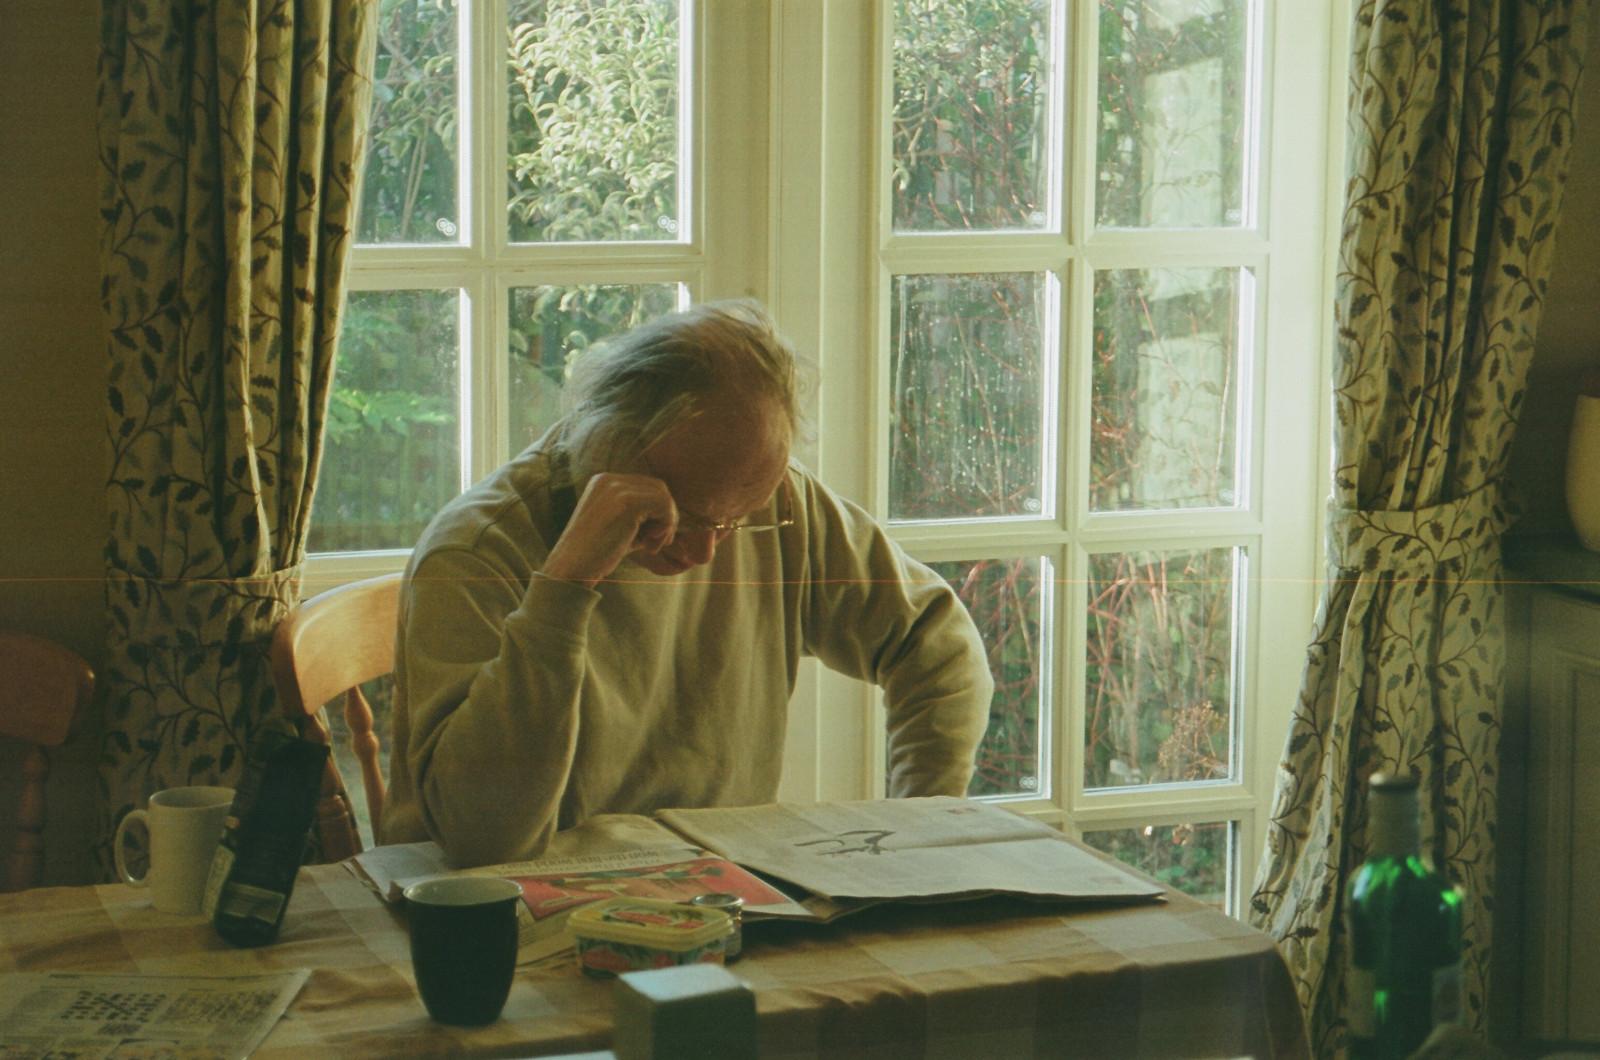 Fondos de pantalla : retrato, ventana, jardín, gafas, sentado ...